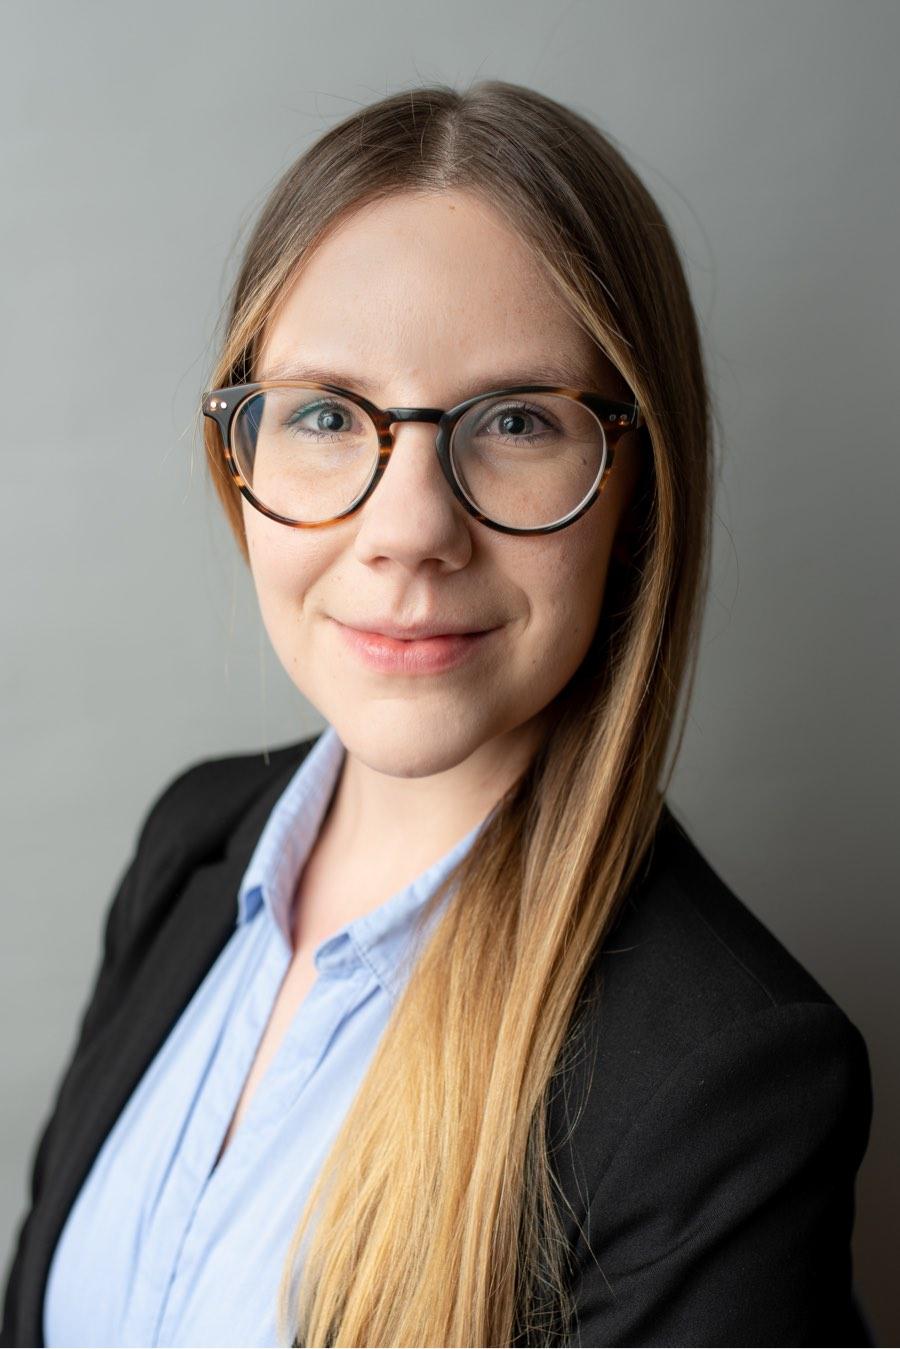 Svenja Weidenhaupt